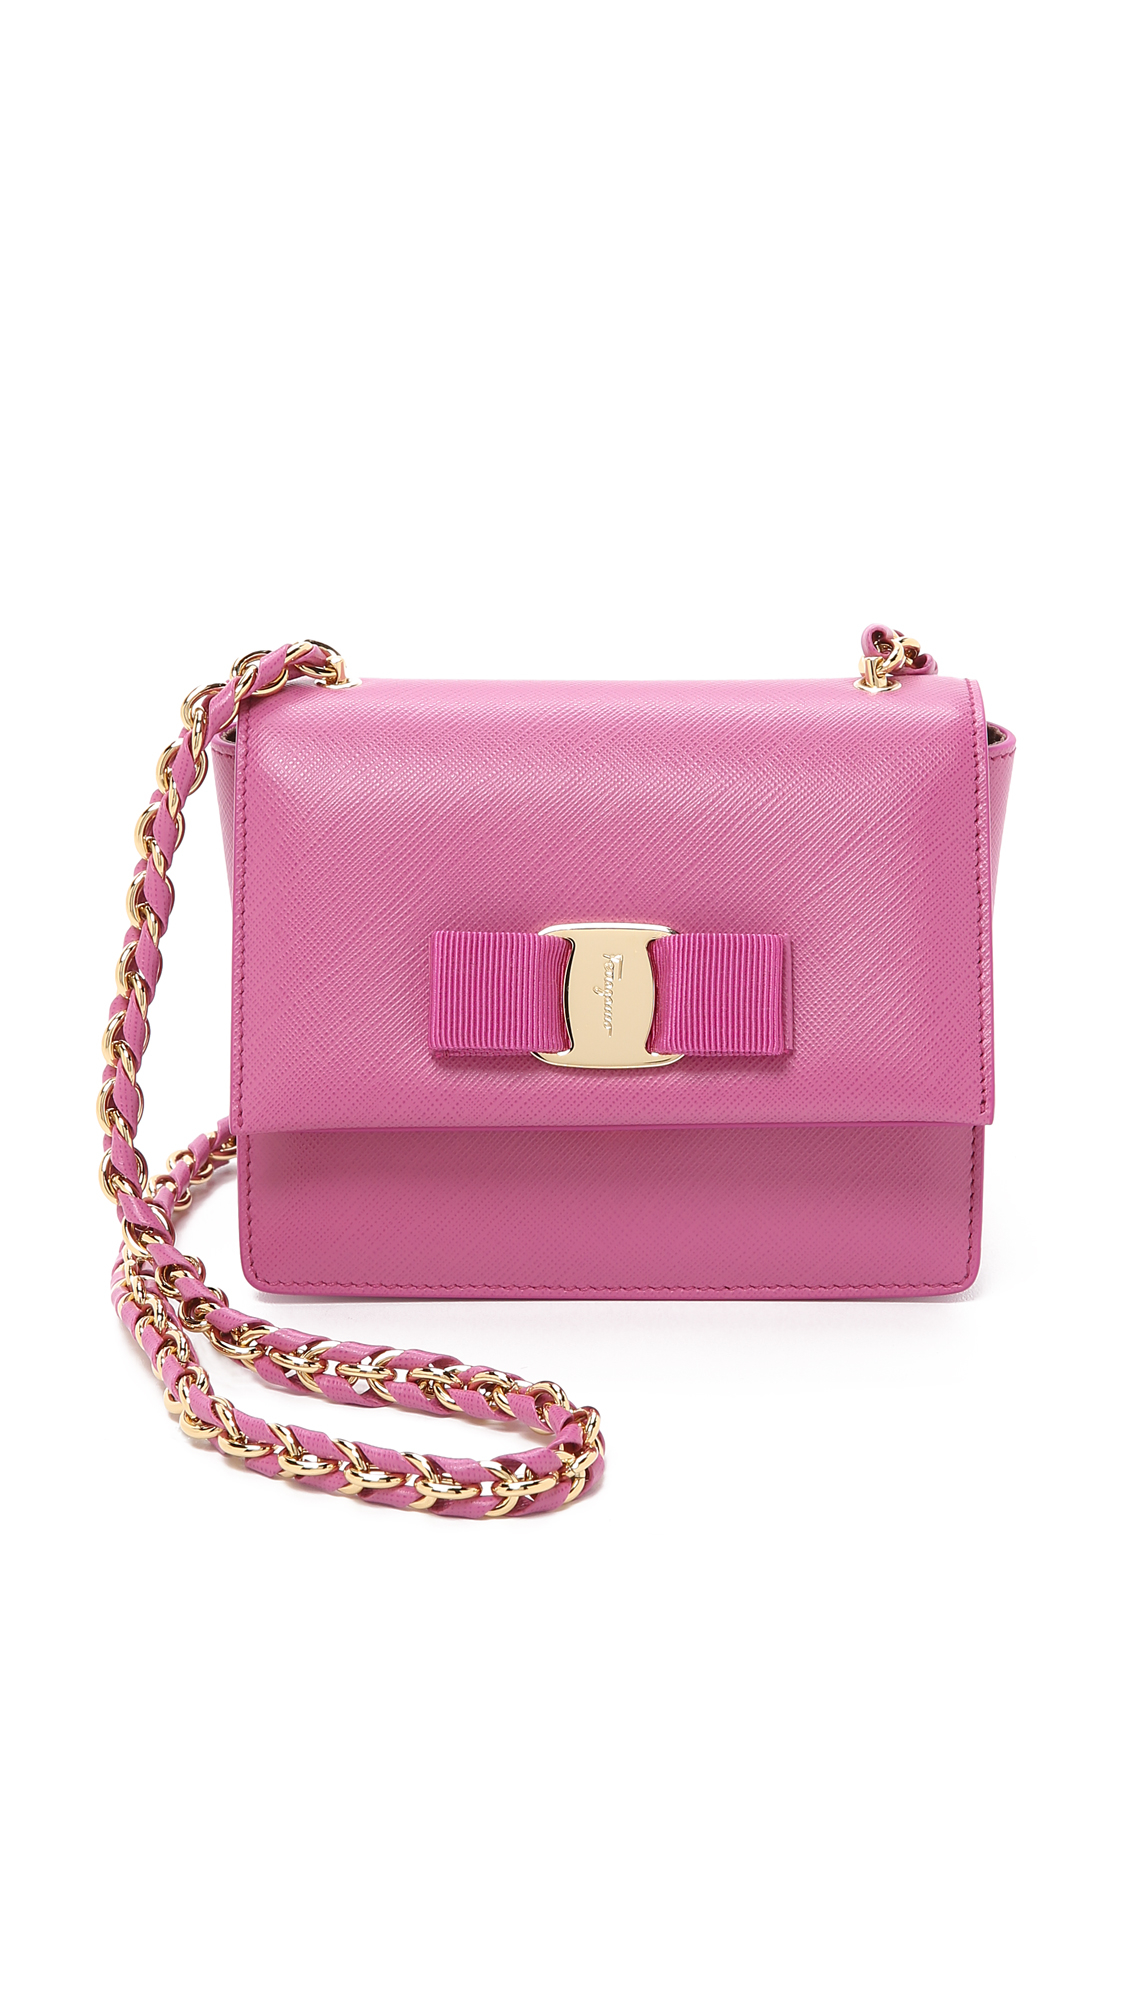 ... new arrival d62f0 01f57 Ferragamo Ginny Cross Body Bag - Anemone in  Purple - Lyst ... 0021c3b068